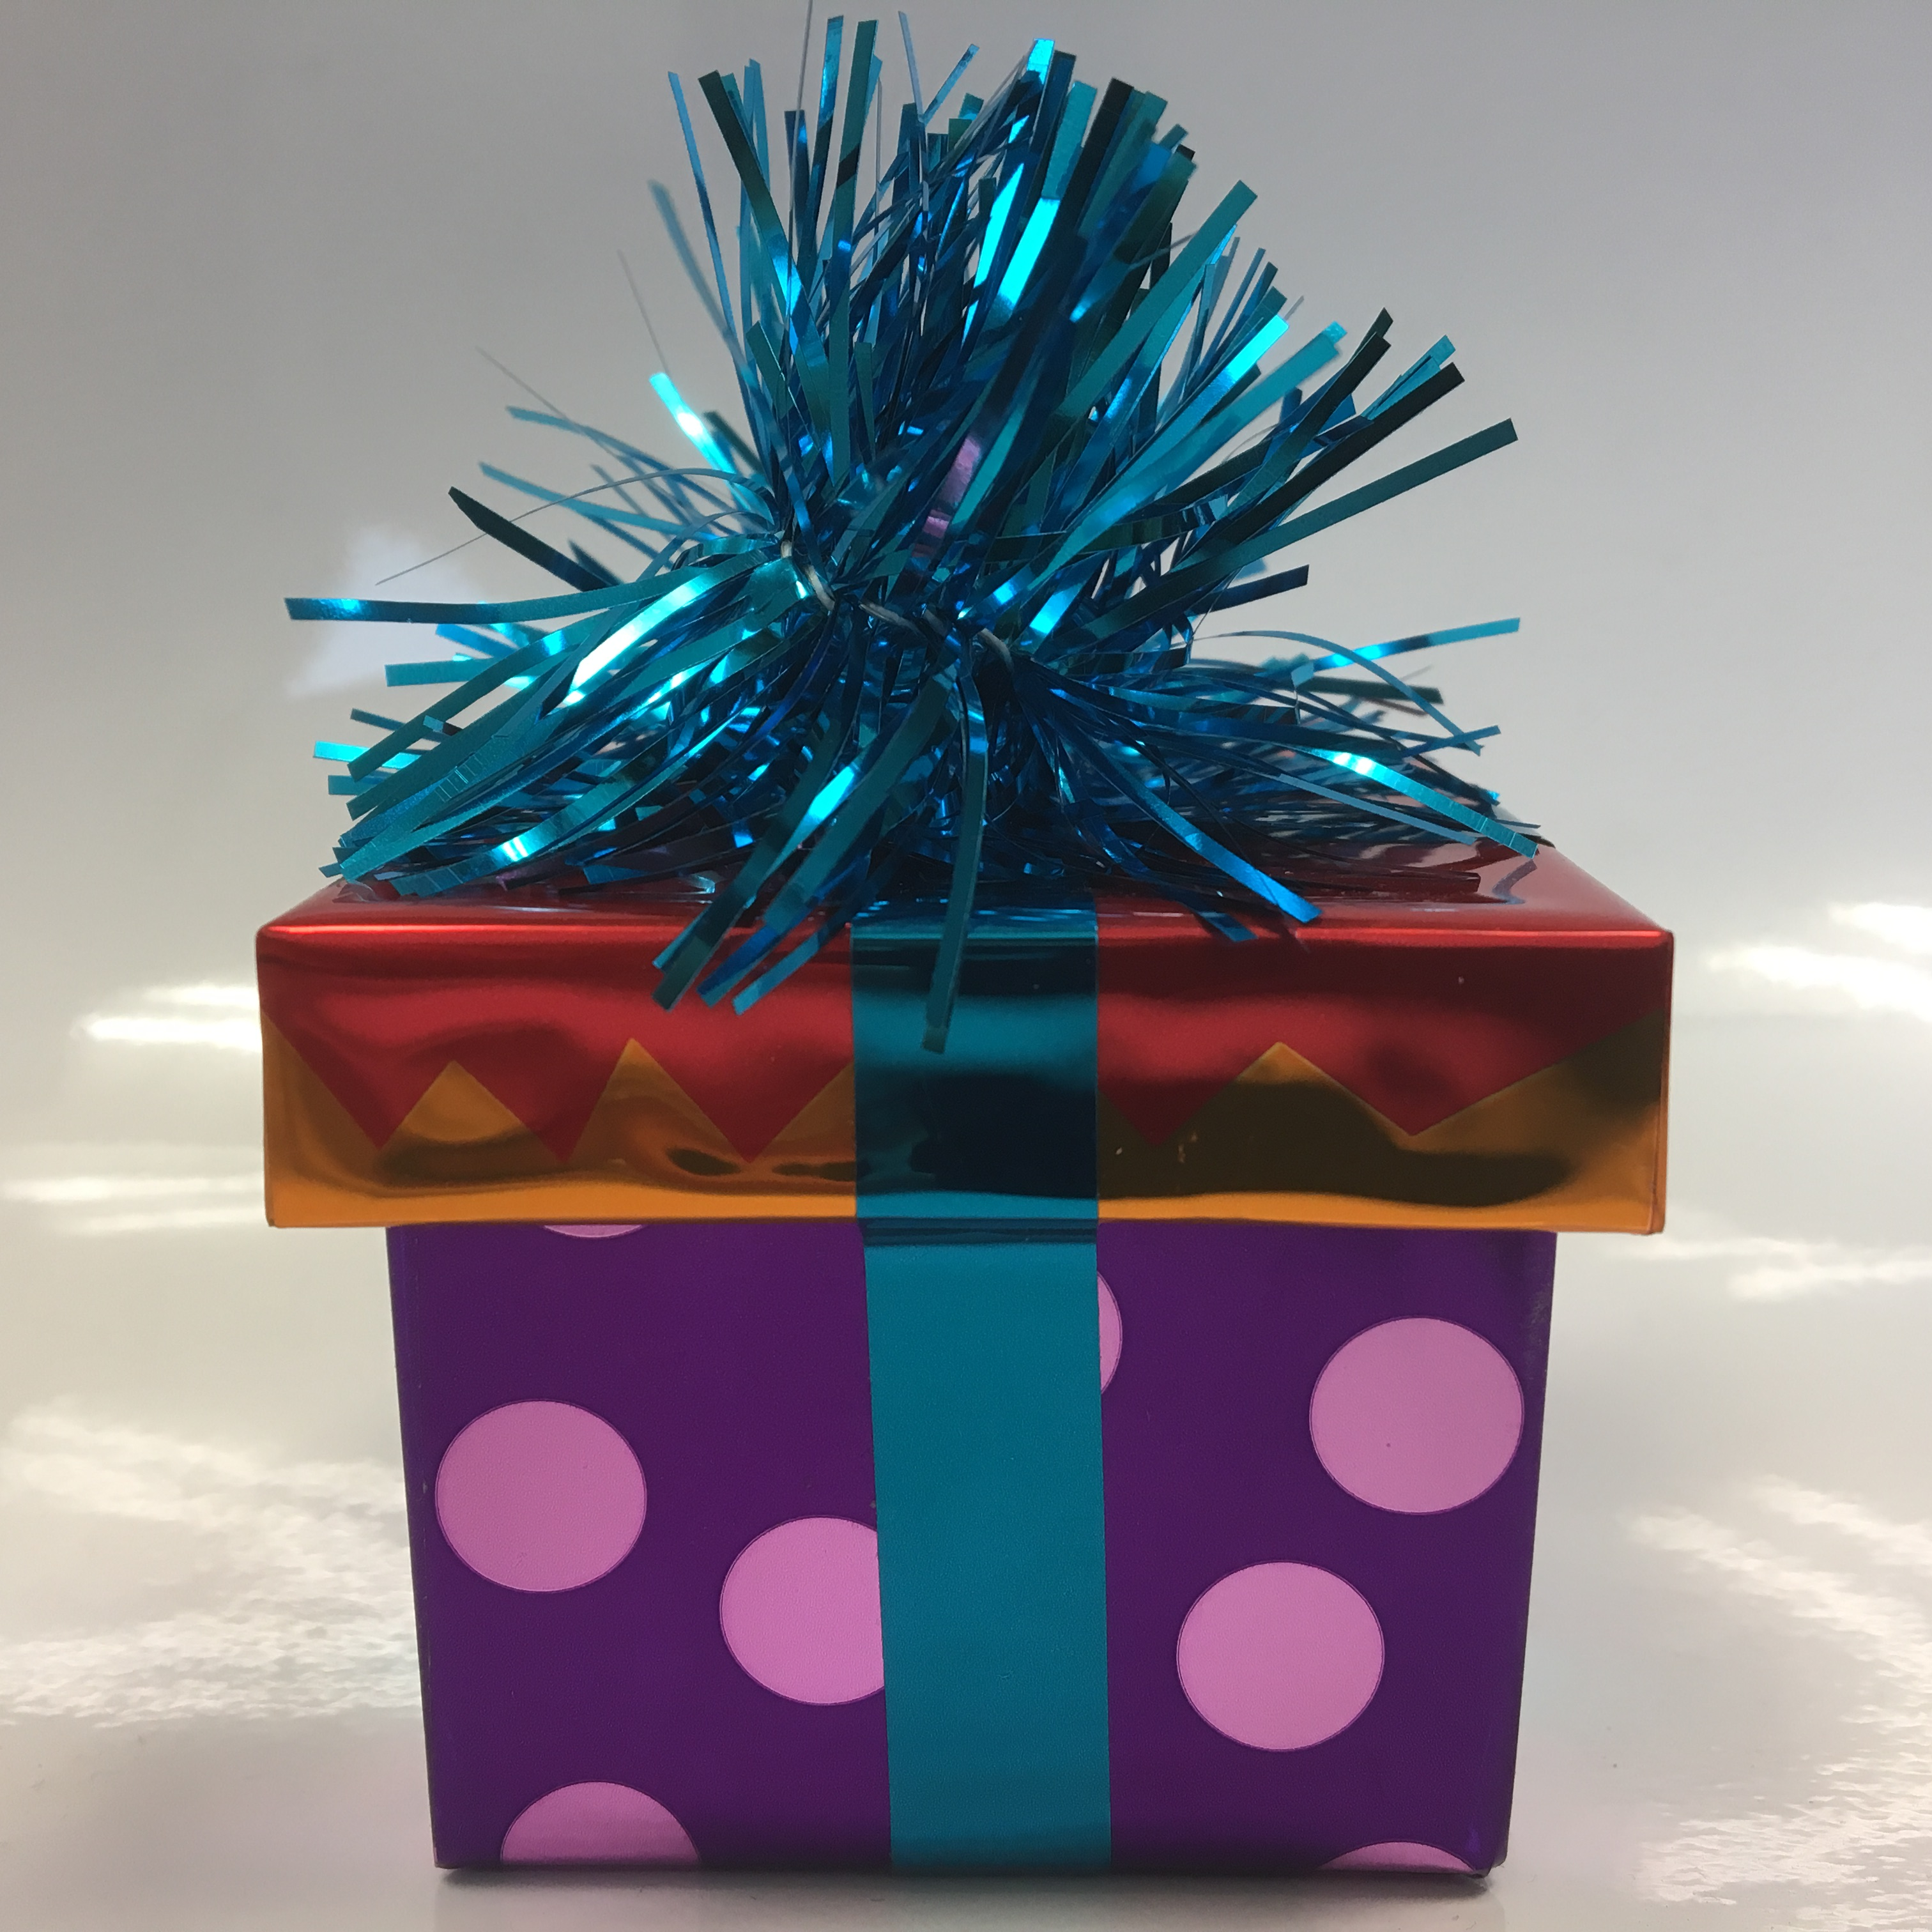 Ballongewicht Geschenk - blaues Geschenkband, roter Deckel